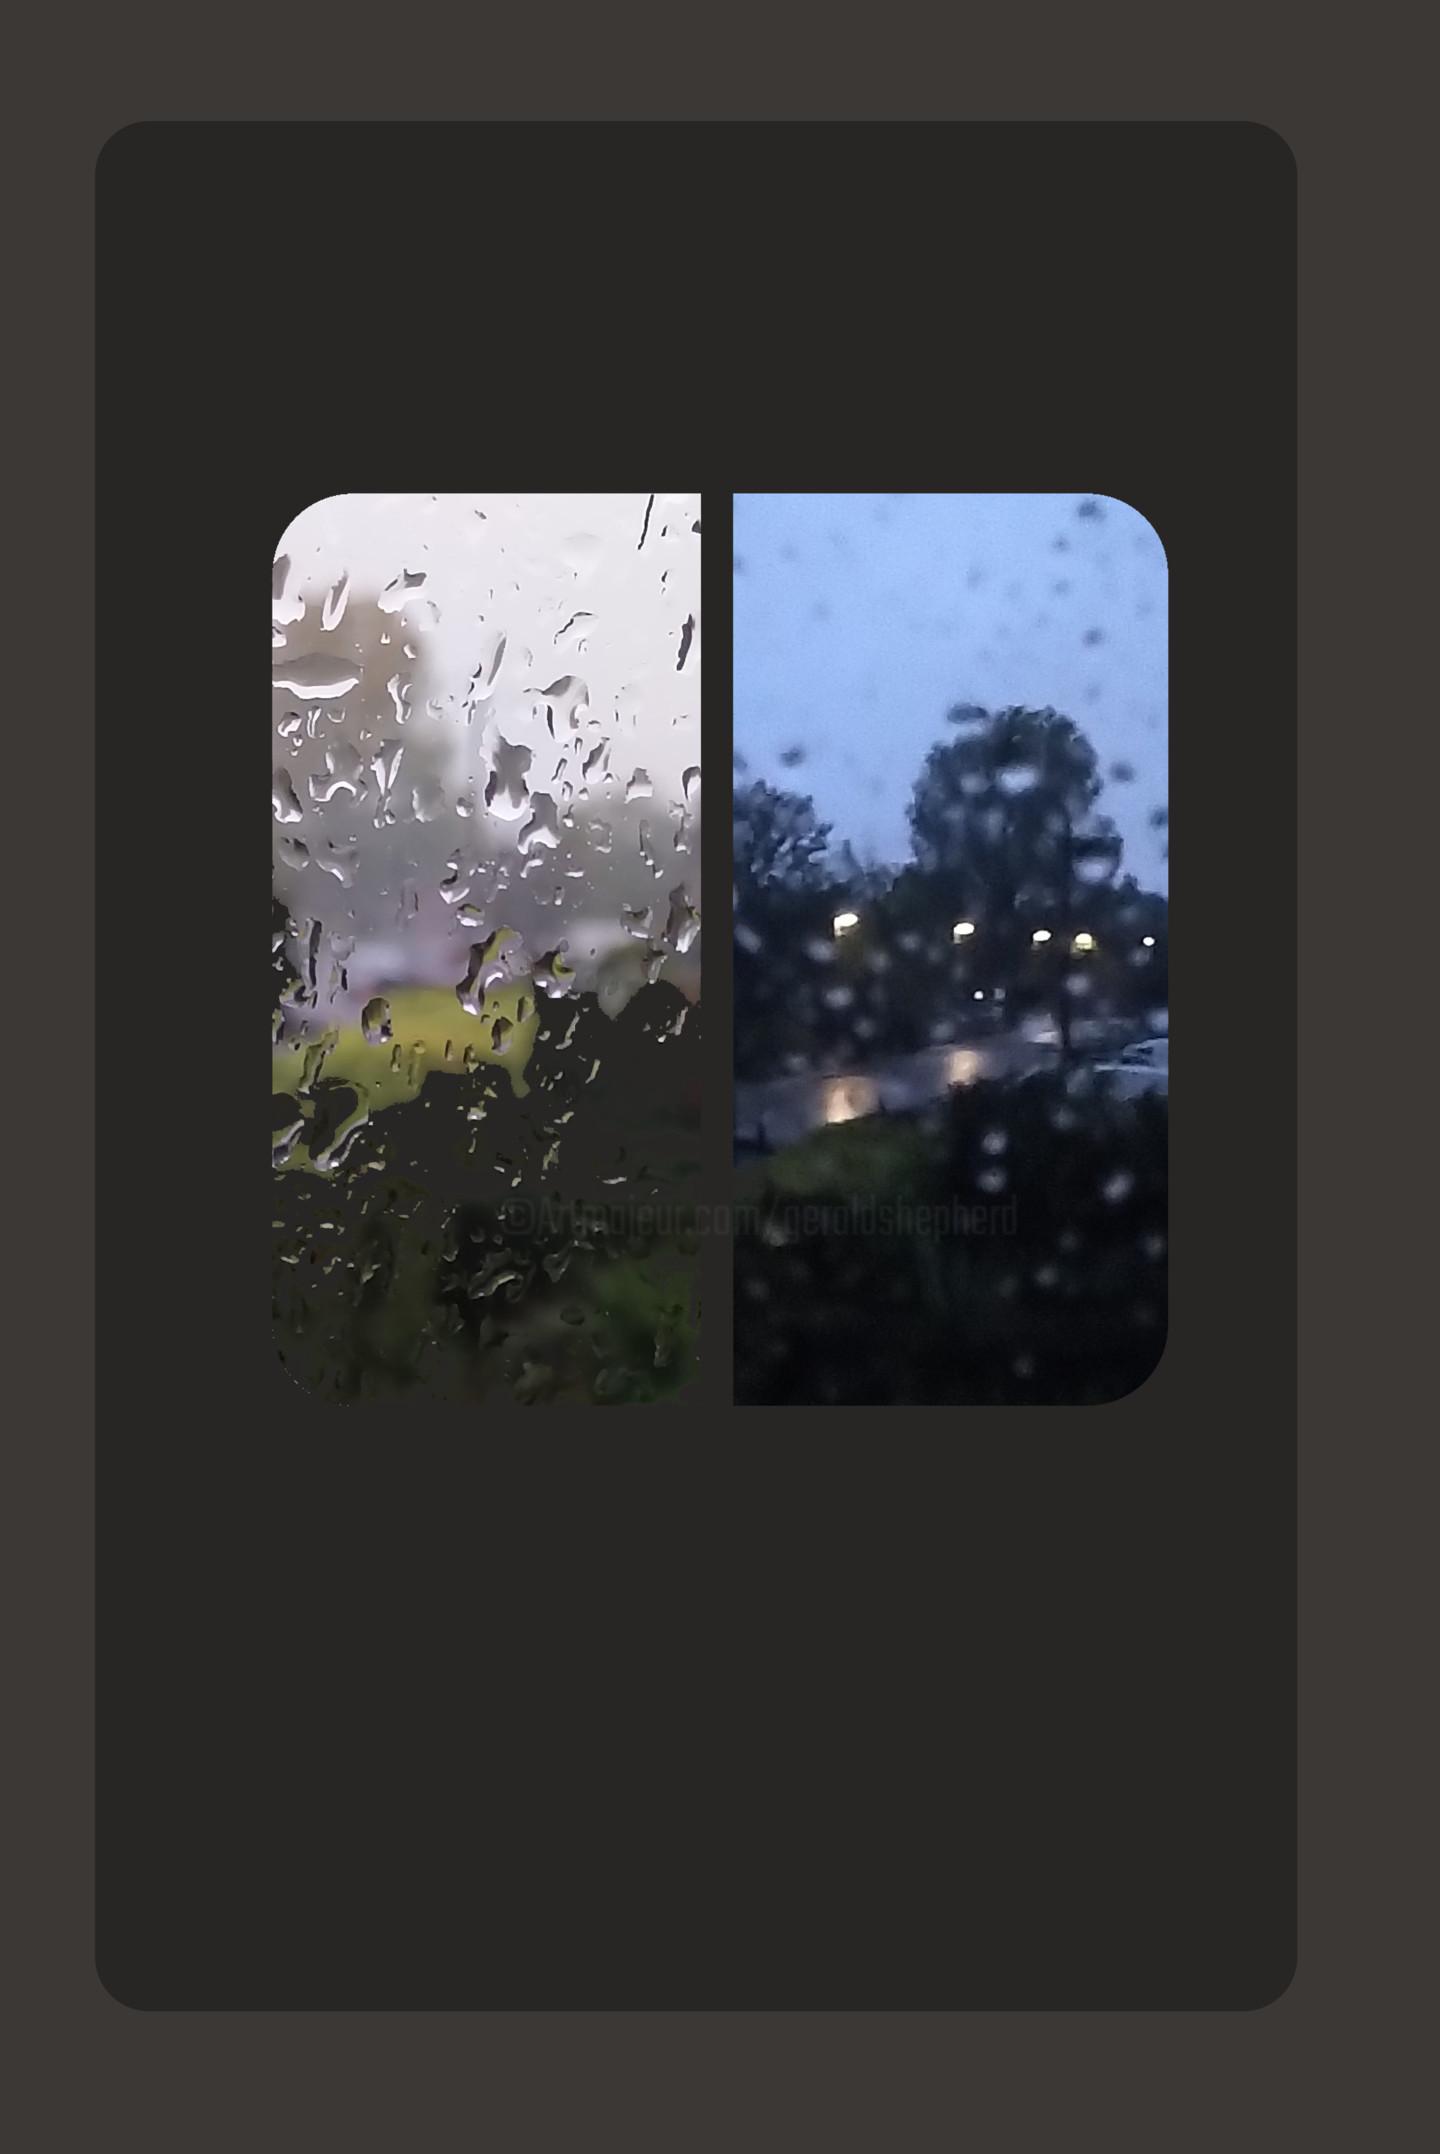 Gerald Shepherd - Wet Day And Night